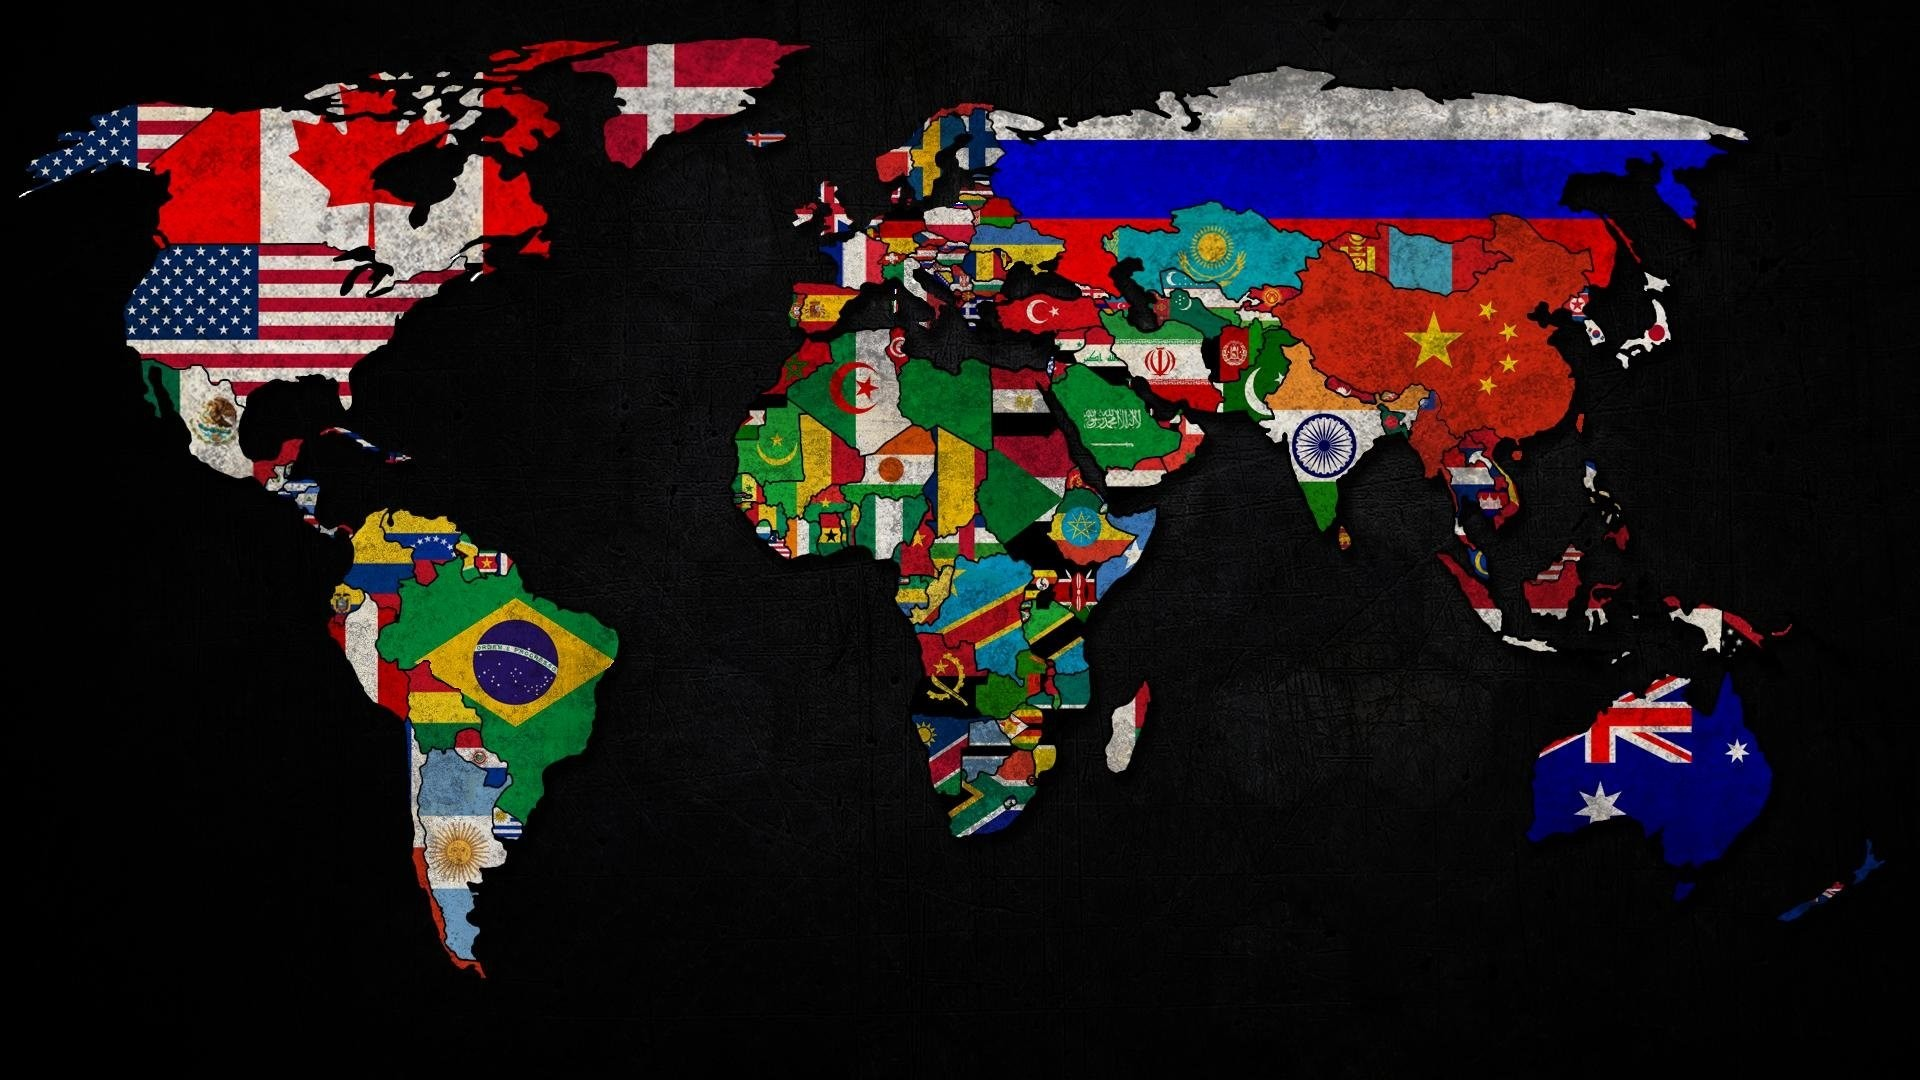 1920x1080 hd wallpaper background id400645 1920x1080 misc world map